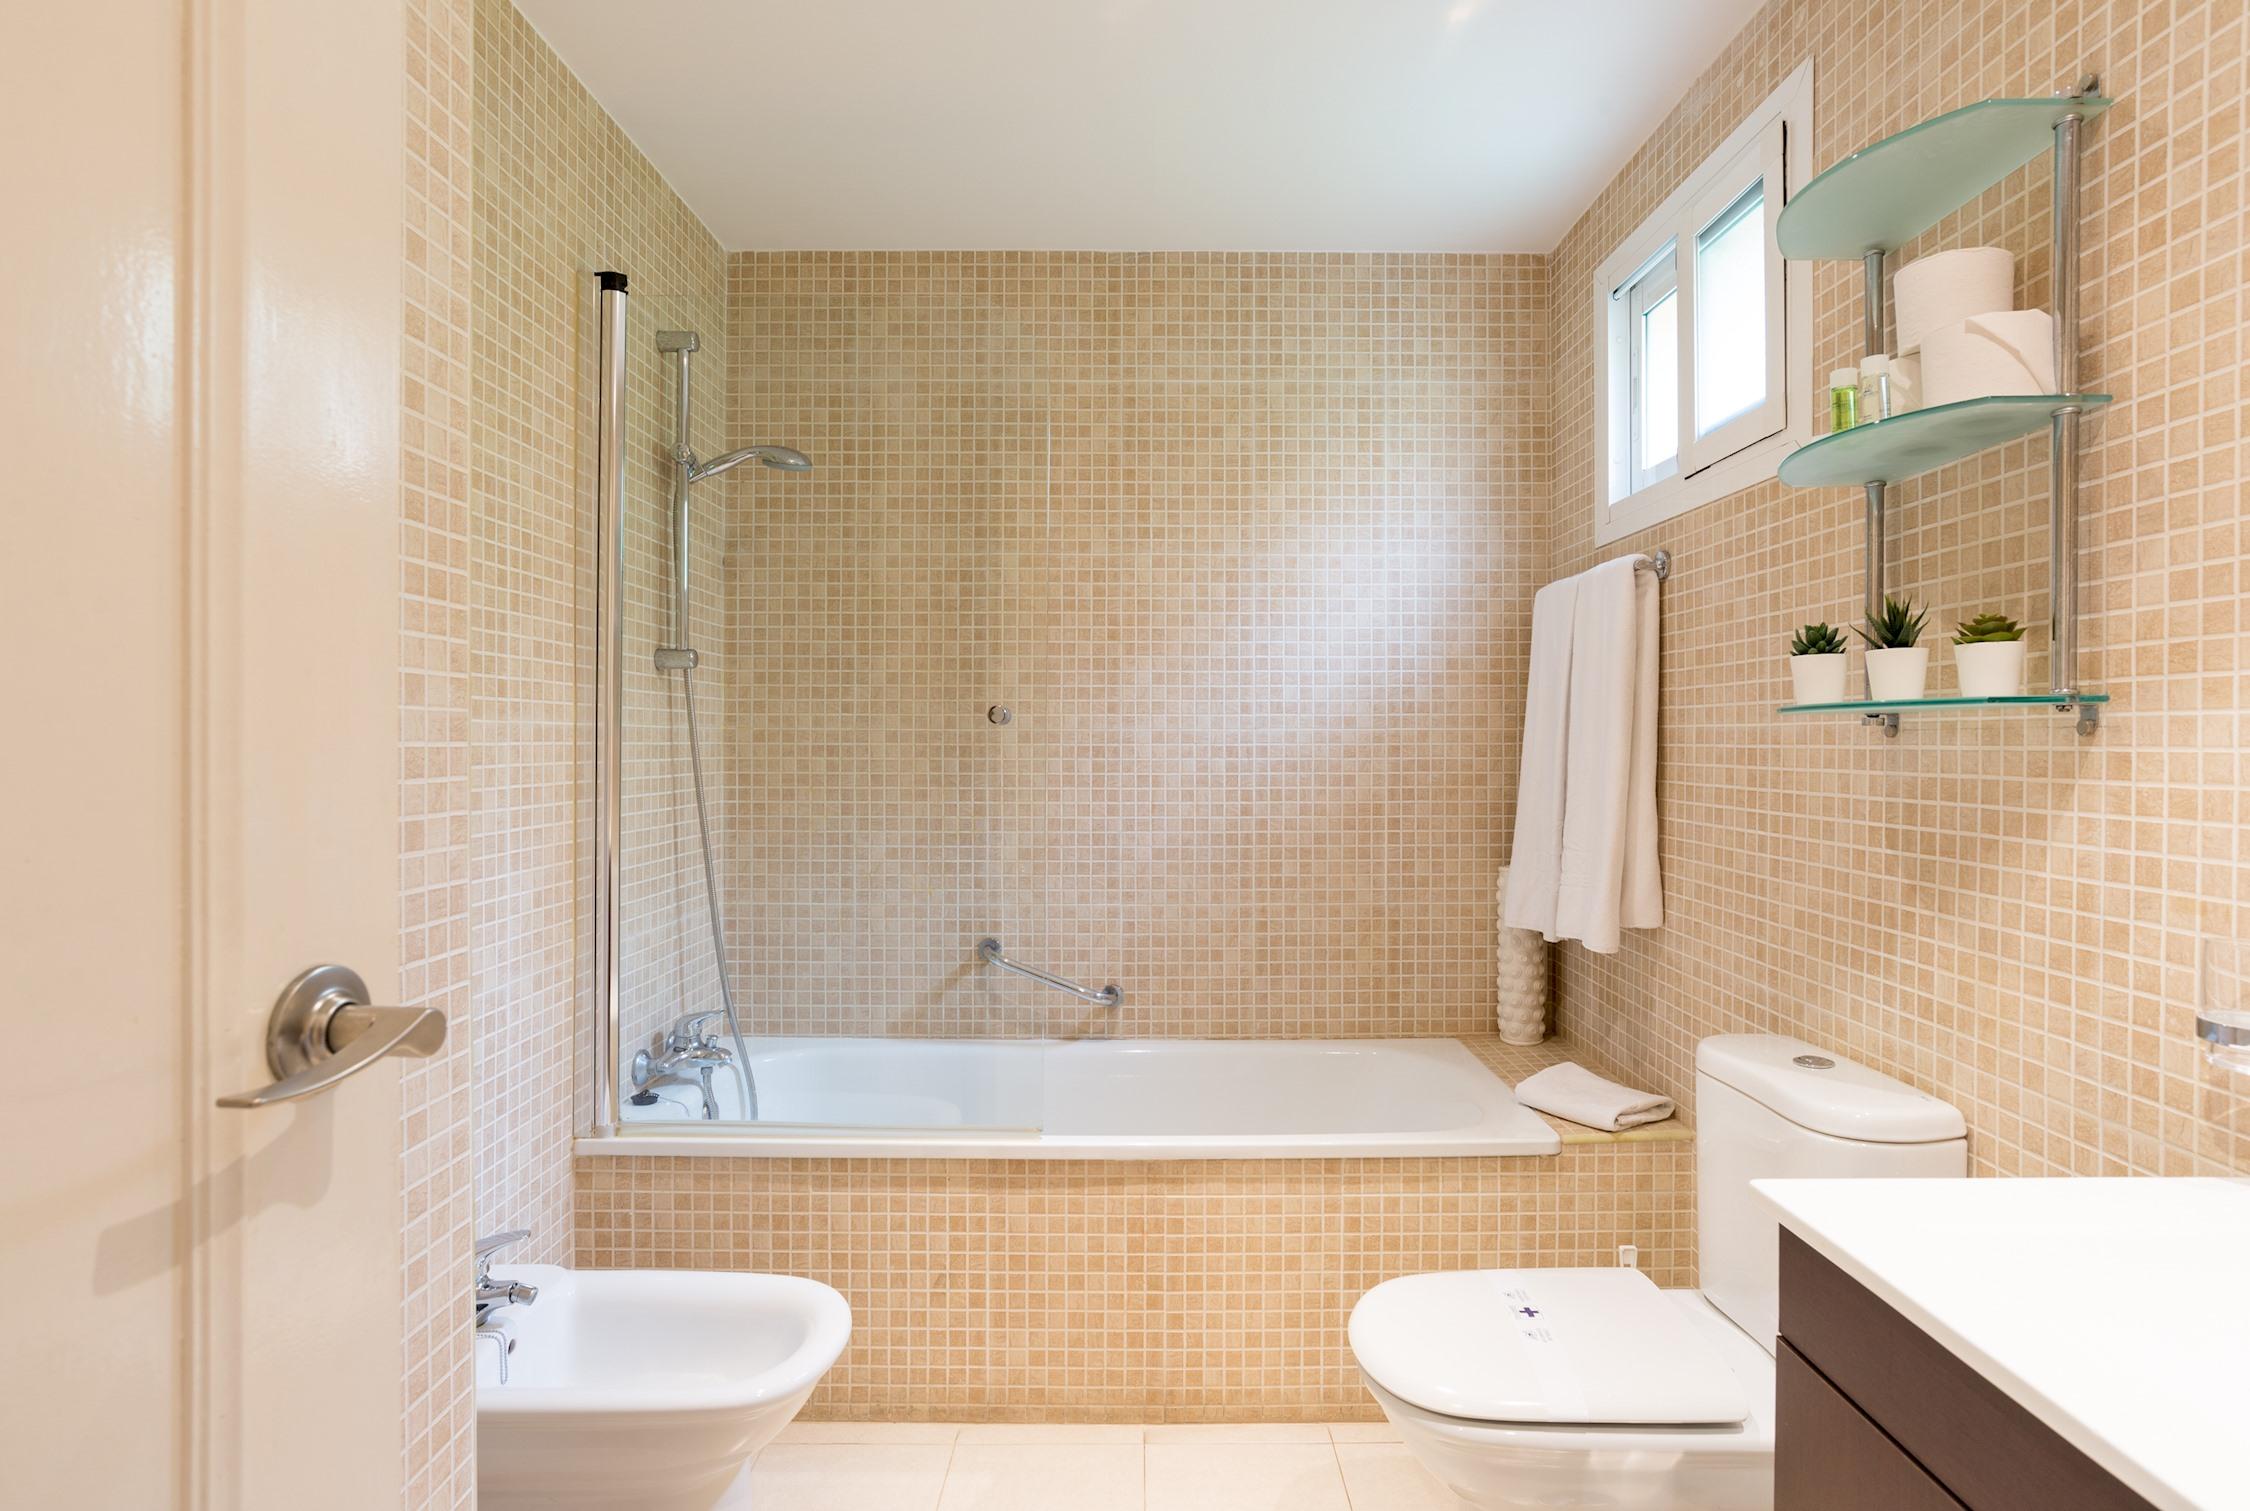 MalagaSuite Luxury & Relax photo 20237528